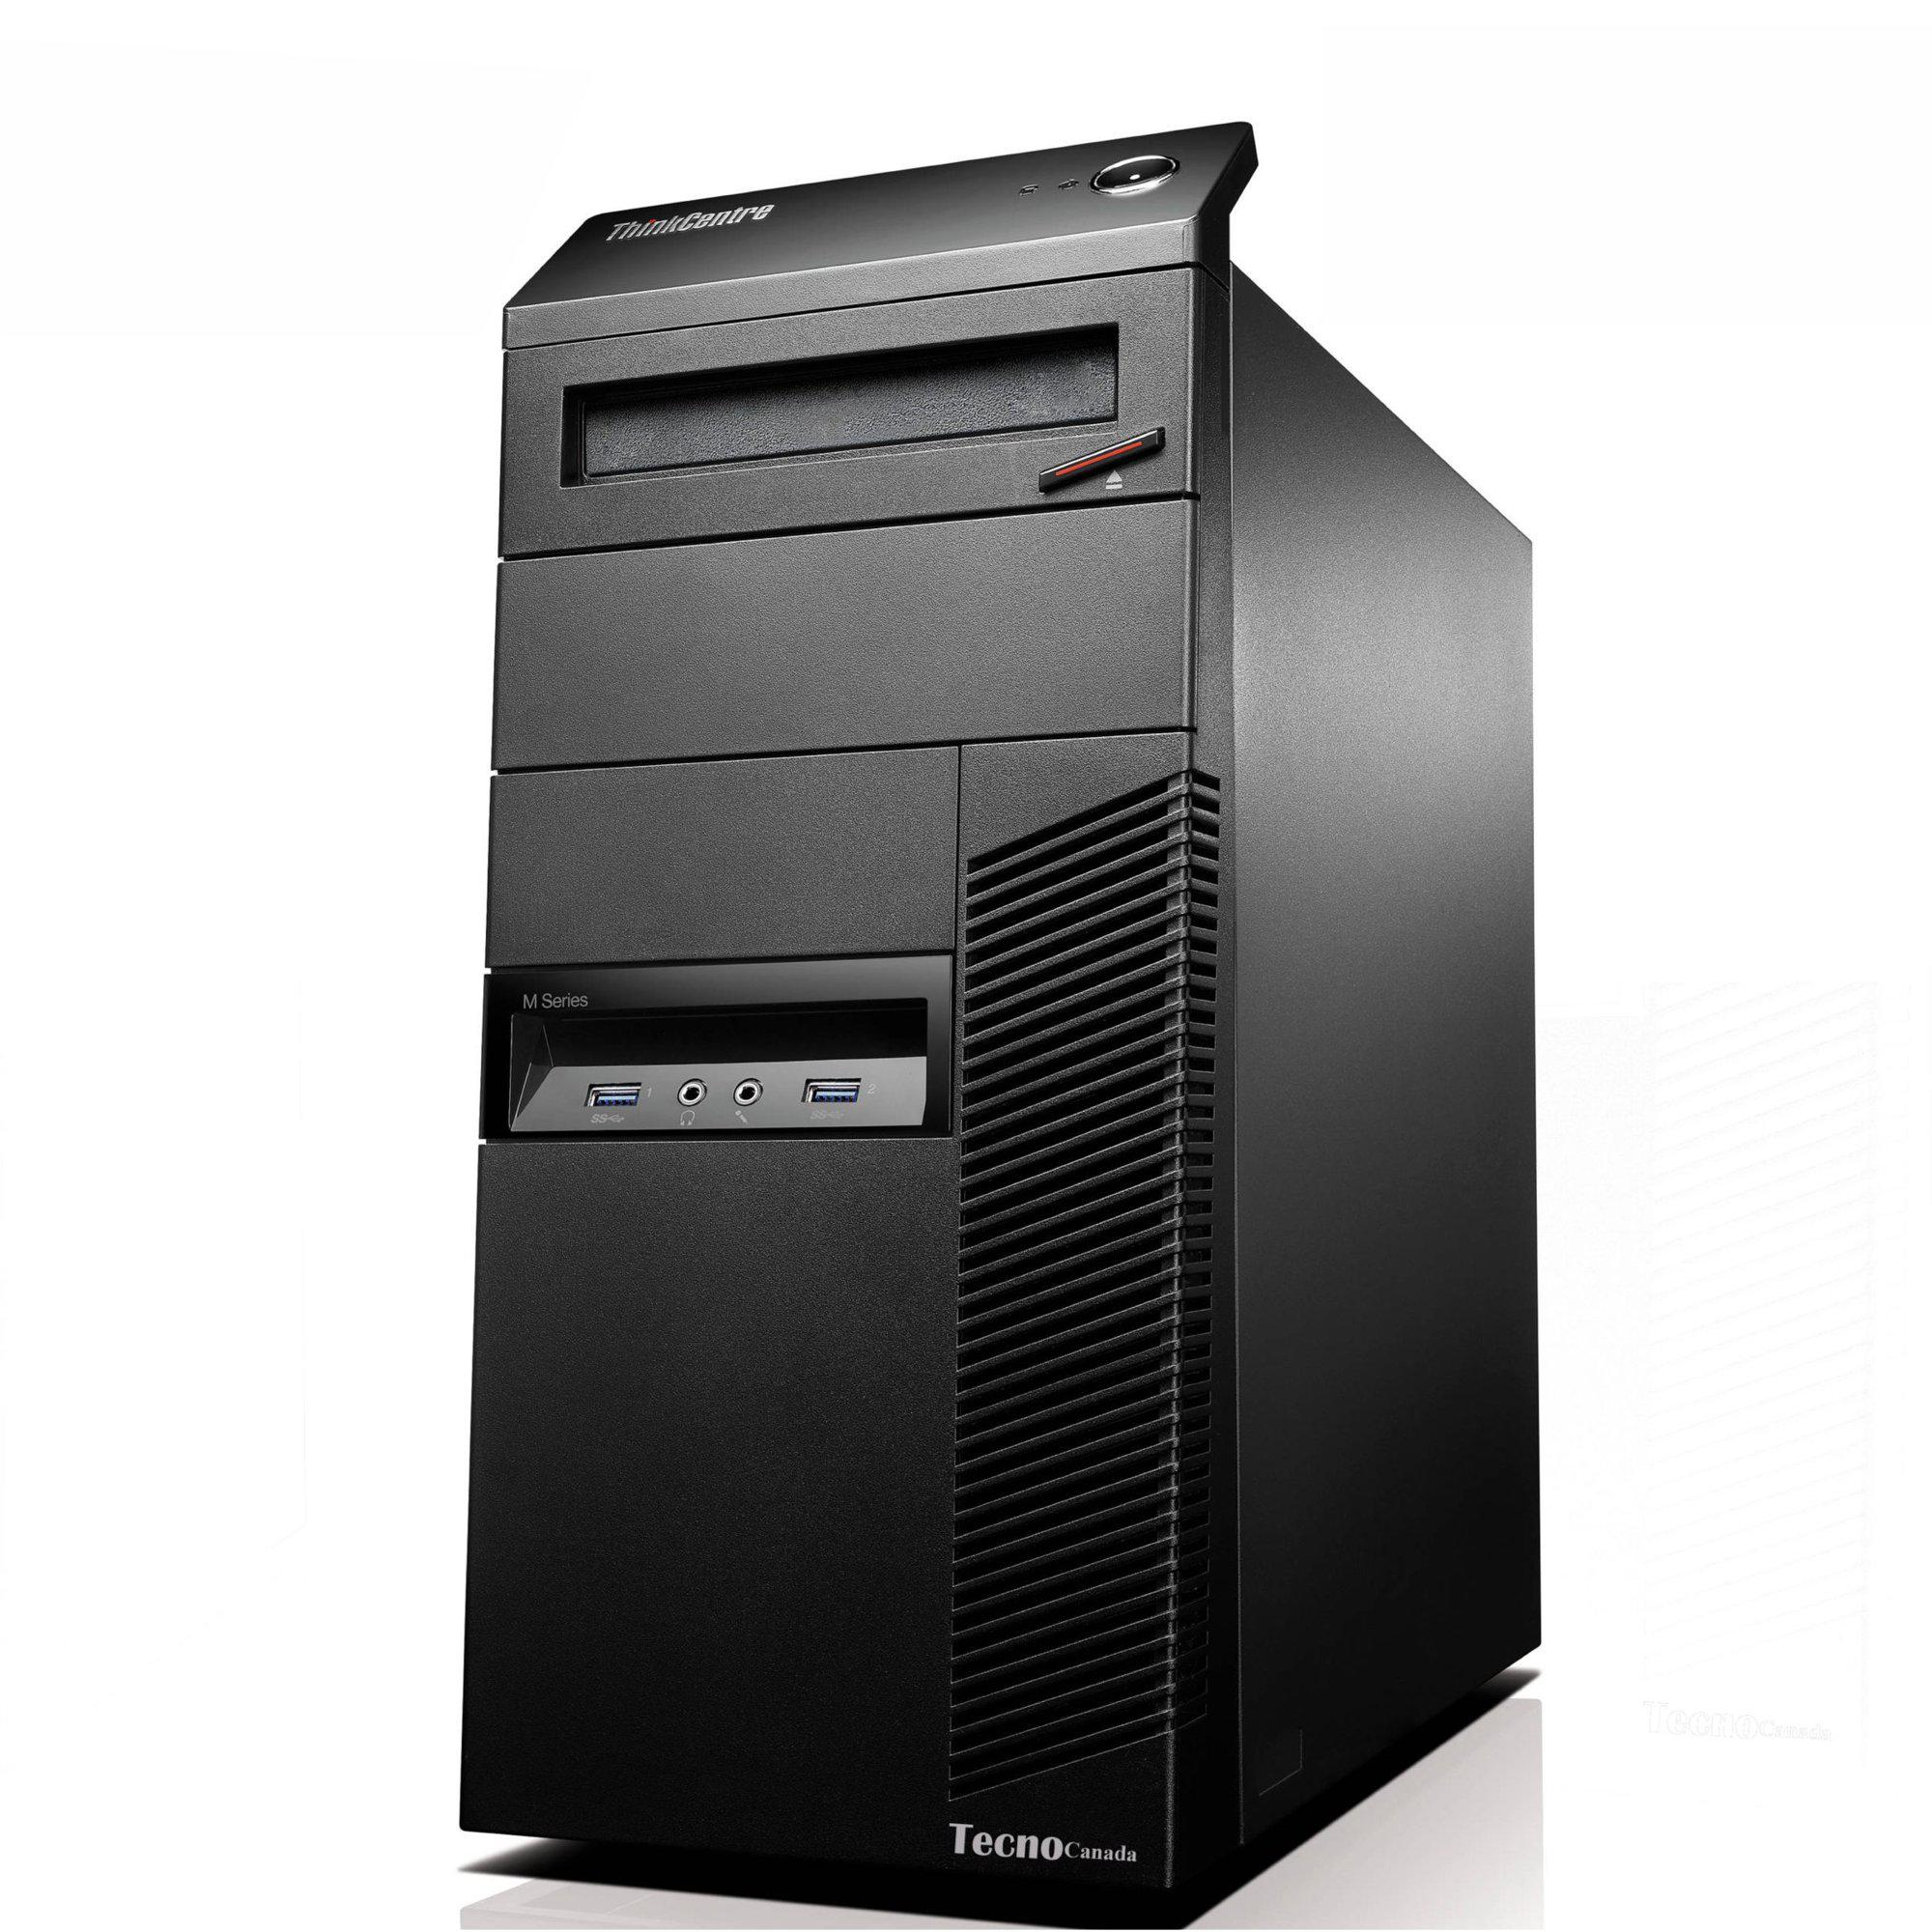 Lenovo ThinkCentre M90P Tour Core i5 3,2 GHz - HDD 2 TB RAM 4 GB